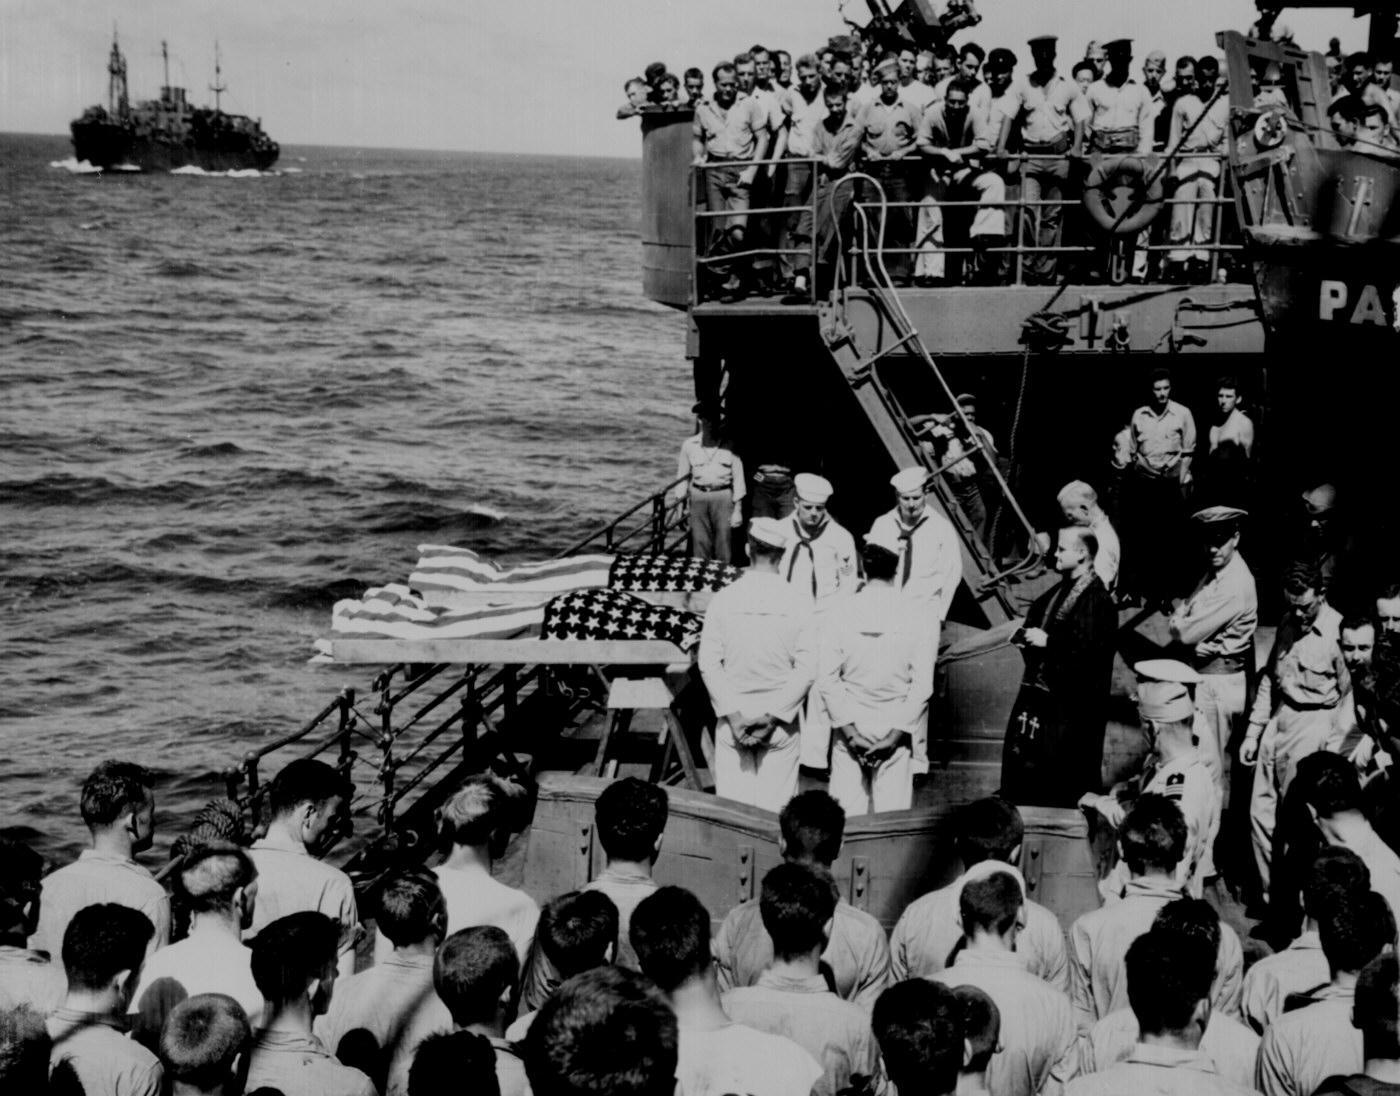 U.S. Military Burial at Sea, World War II